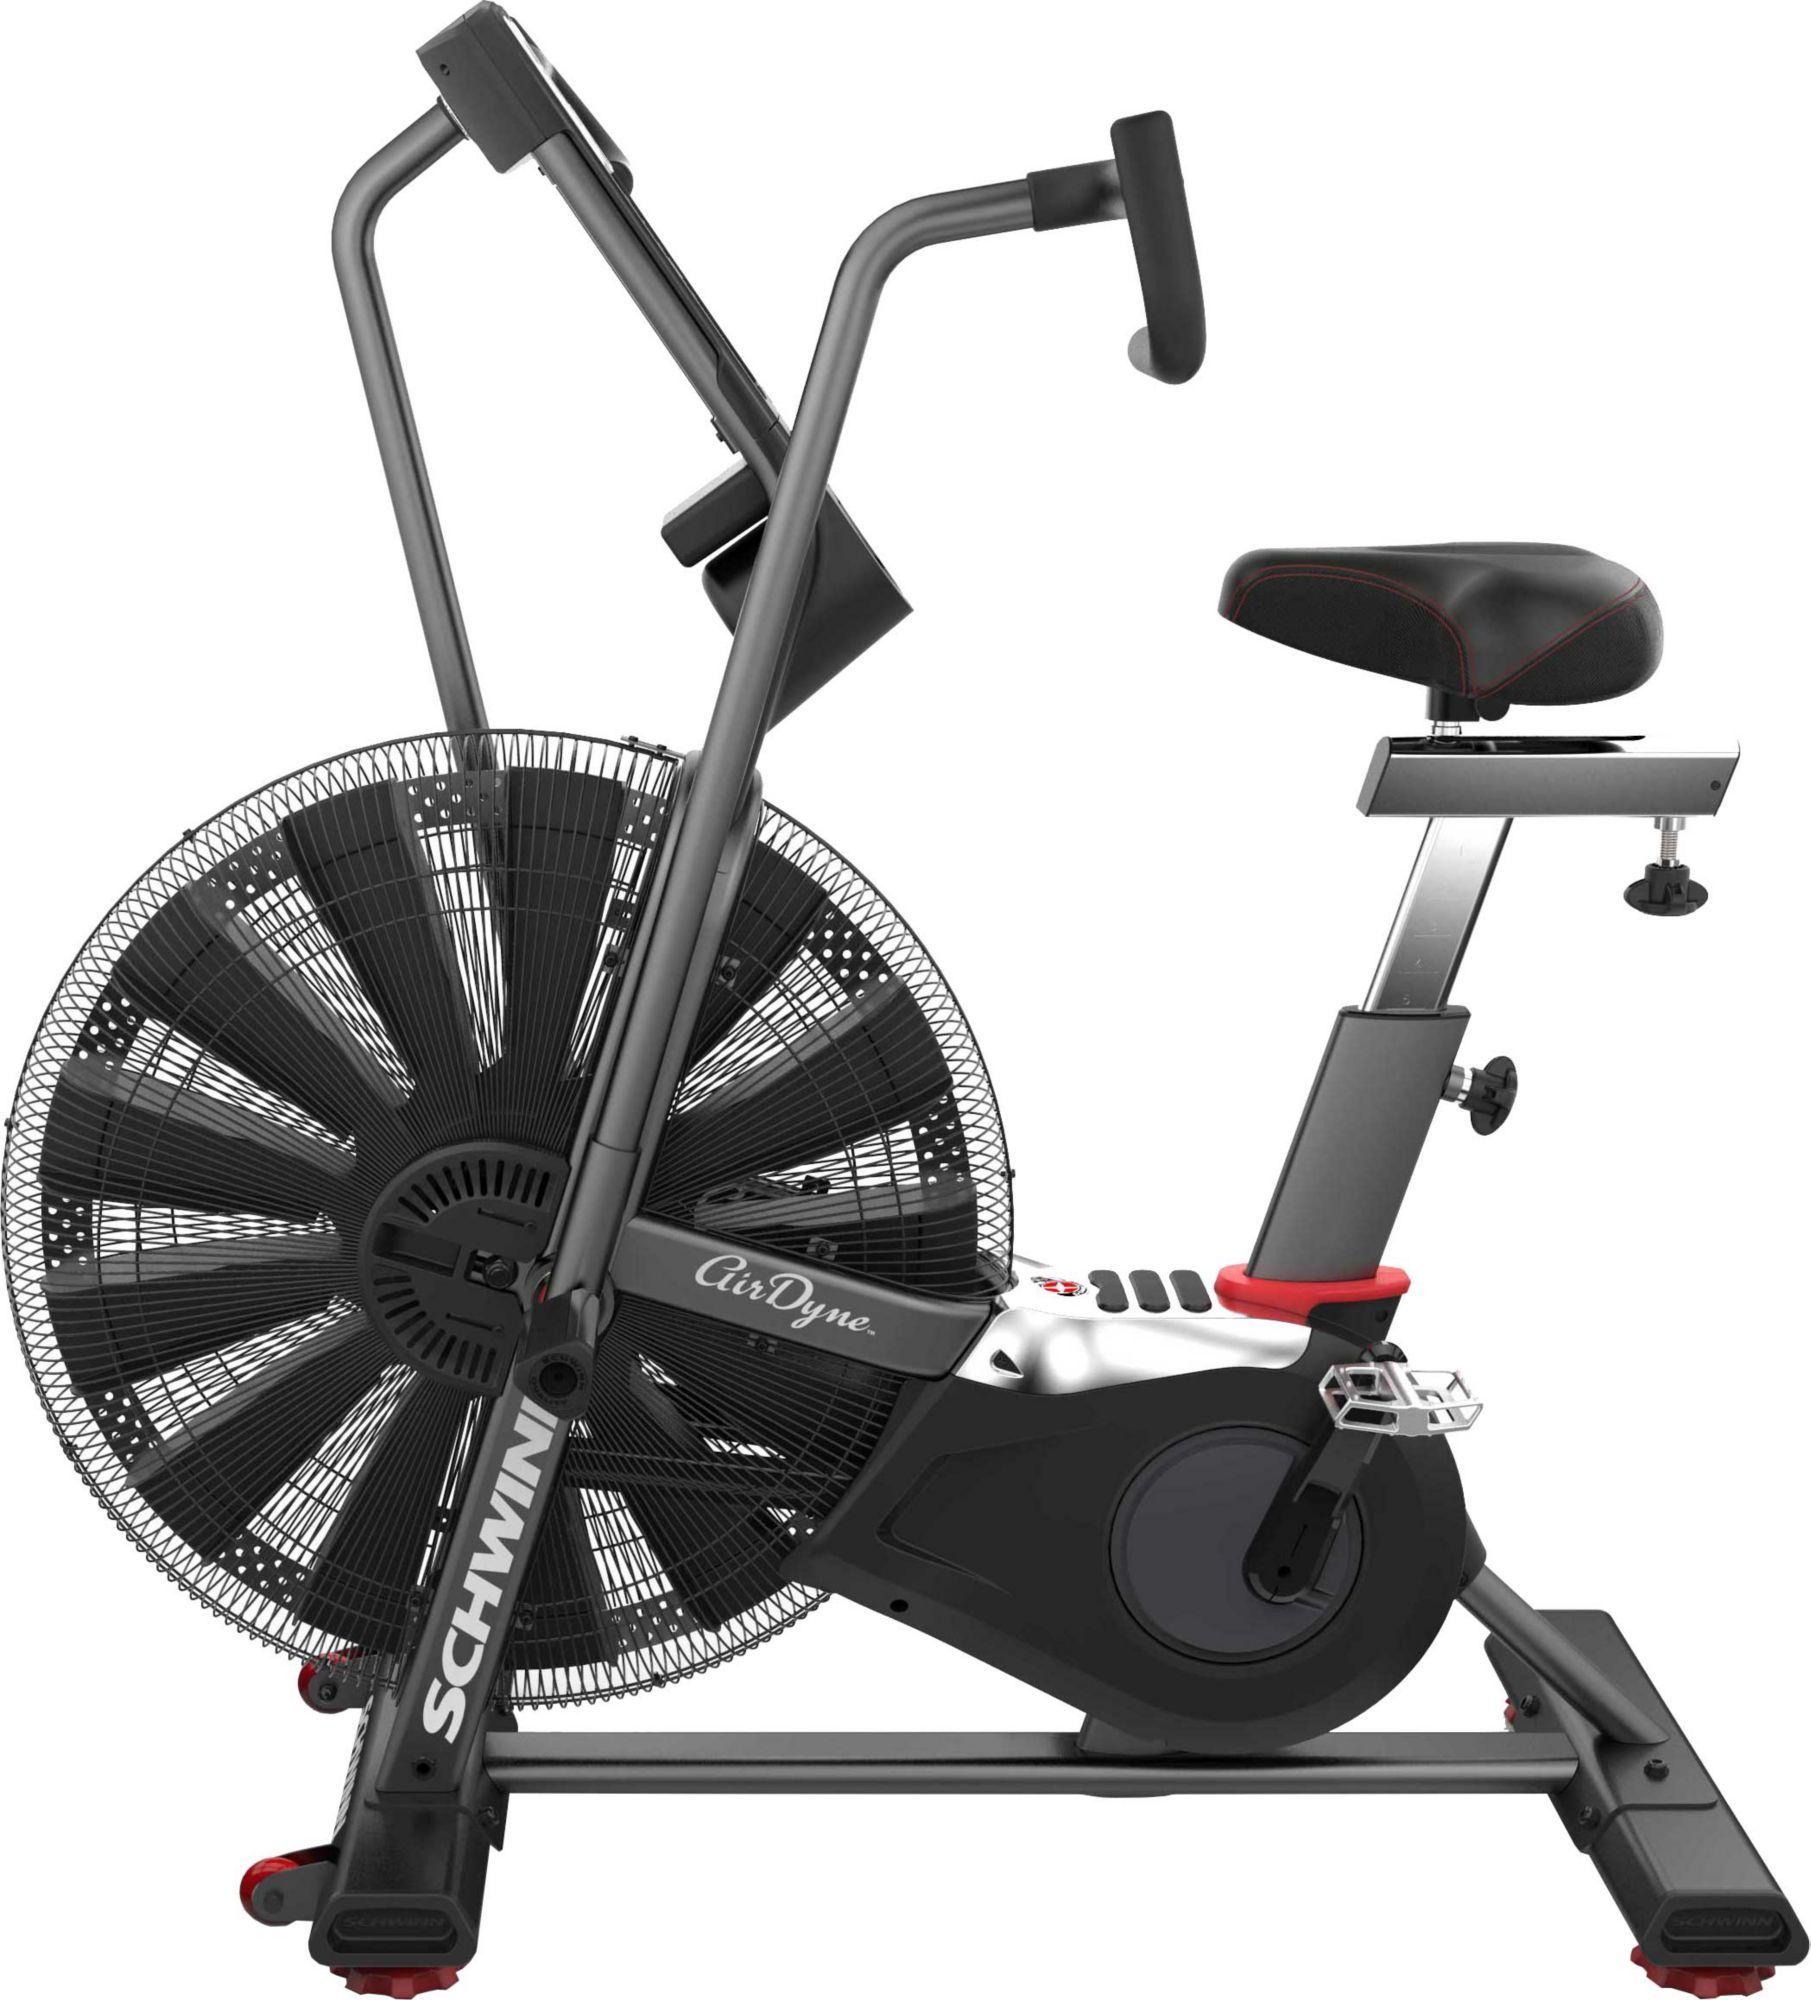 Schwinn AD7 Airdyne Exercise Bike Crossfit equipment